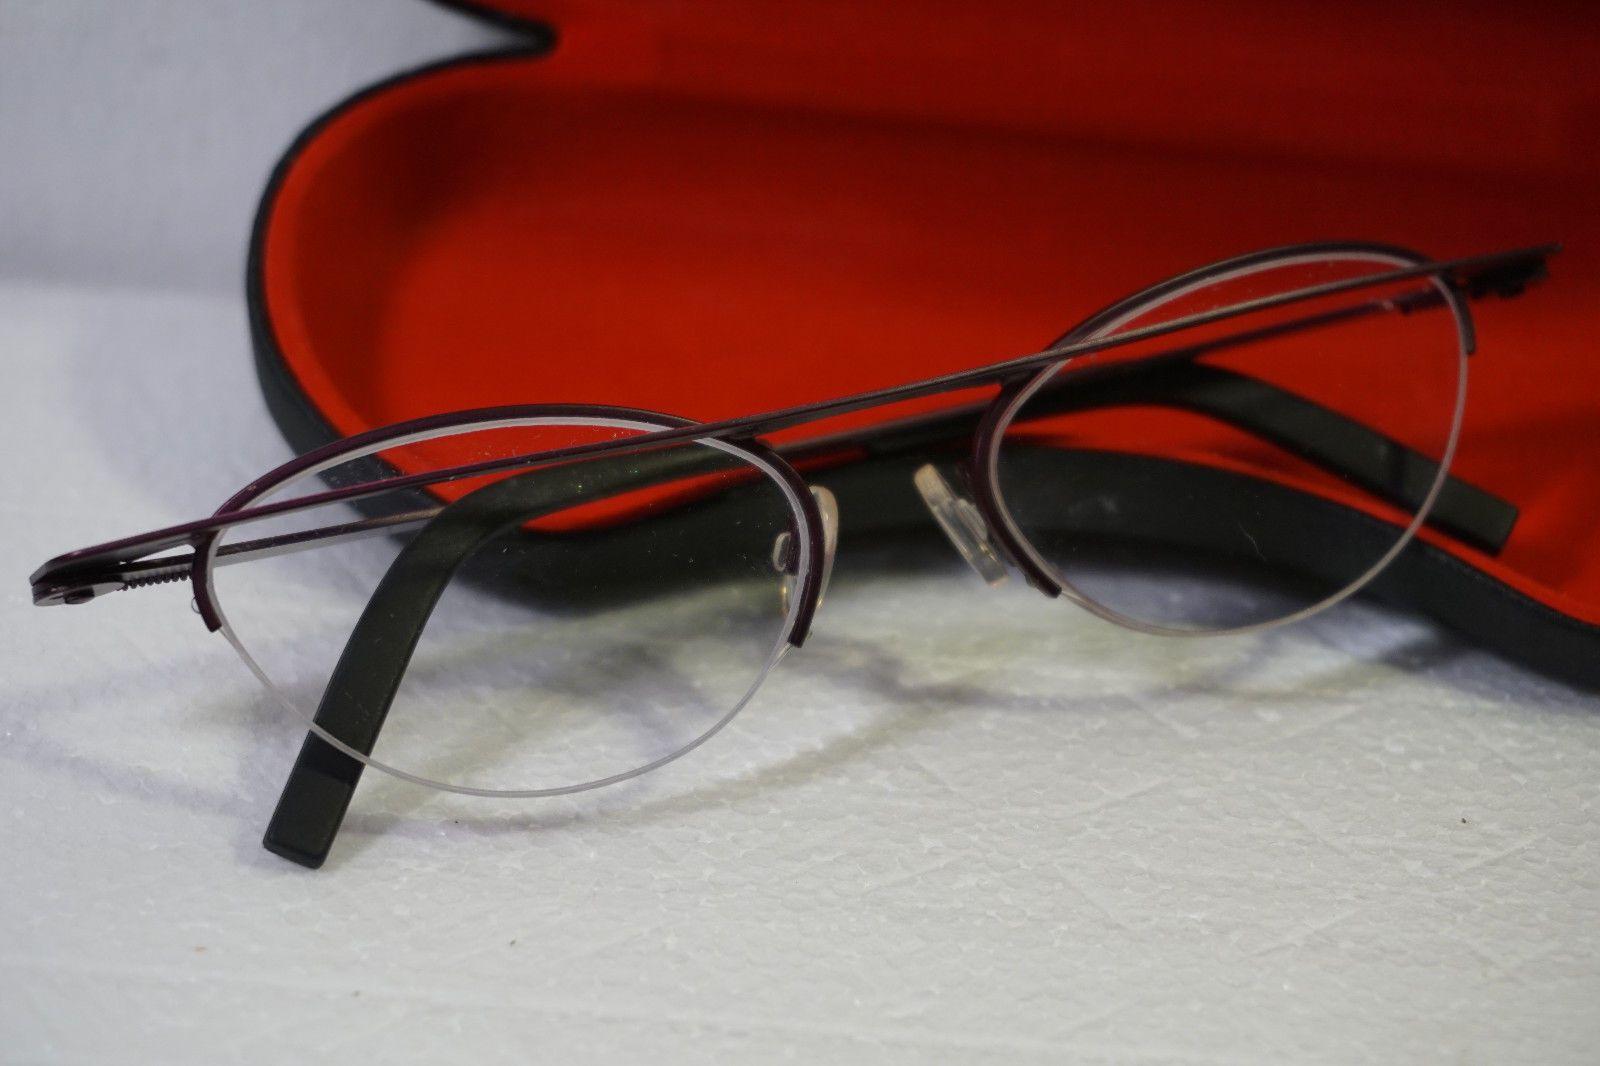 0db4db9018 Theo Tortilla Aluminum Eyeglass Frames Fushcia Aubergine Interesting Design